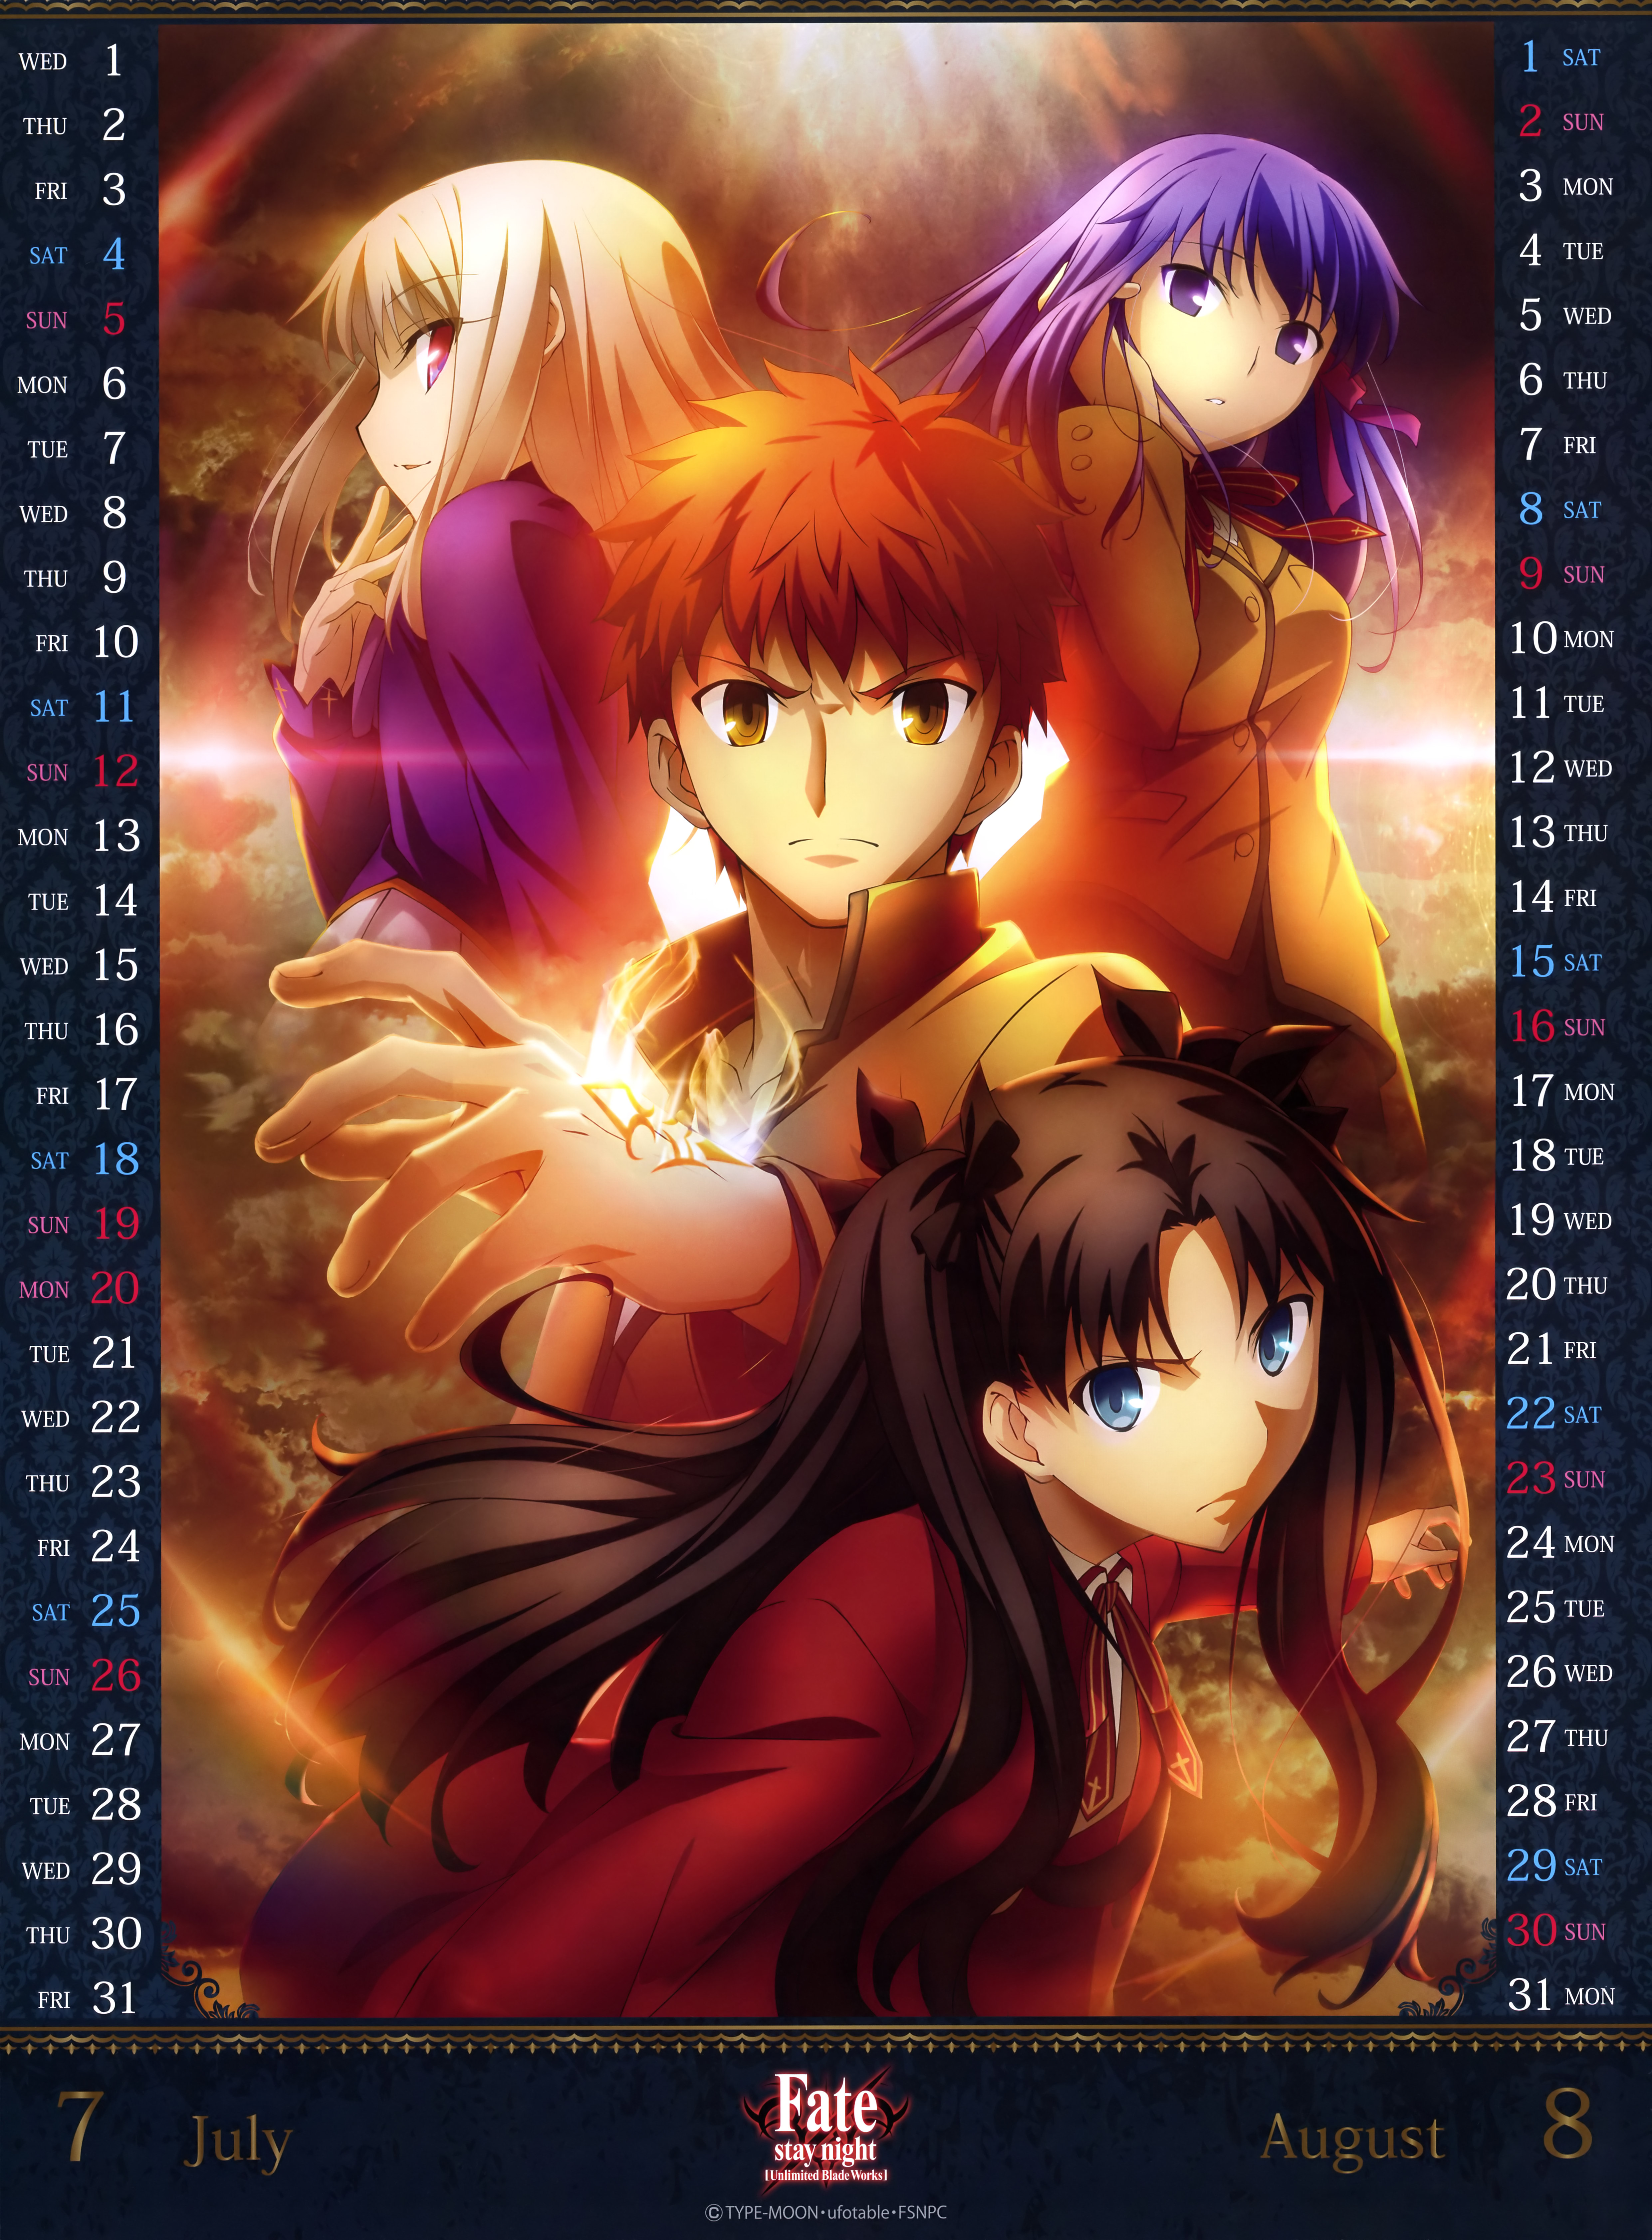 Fate/stay night: unlimited blade works emiya hd wallpaper download.